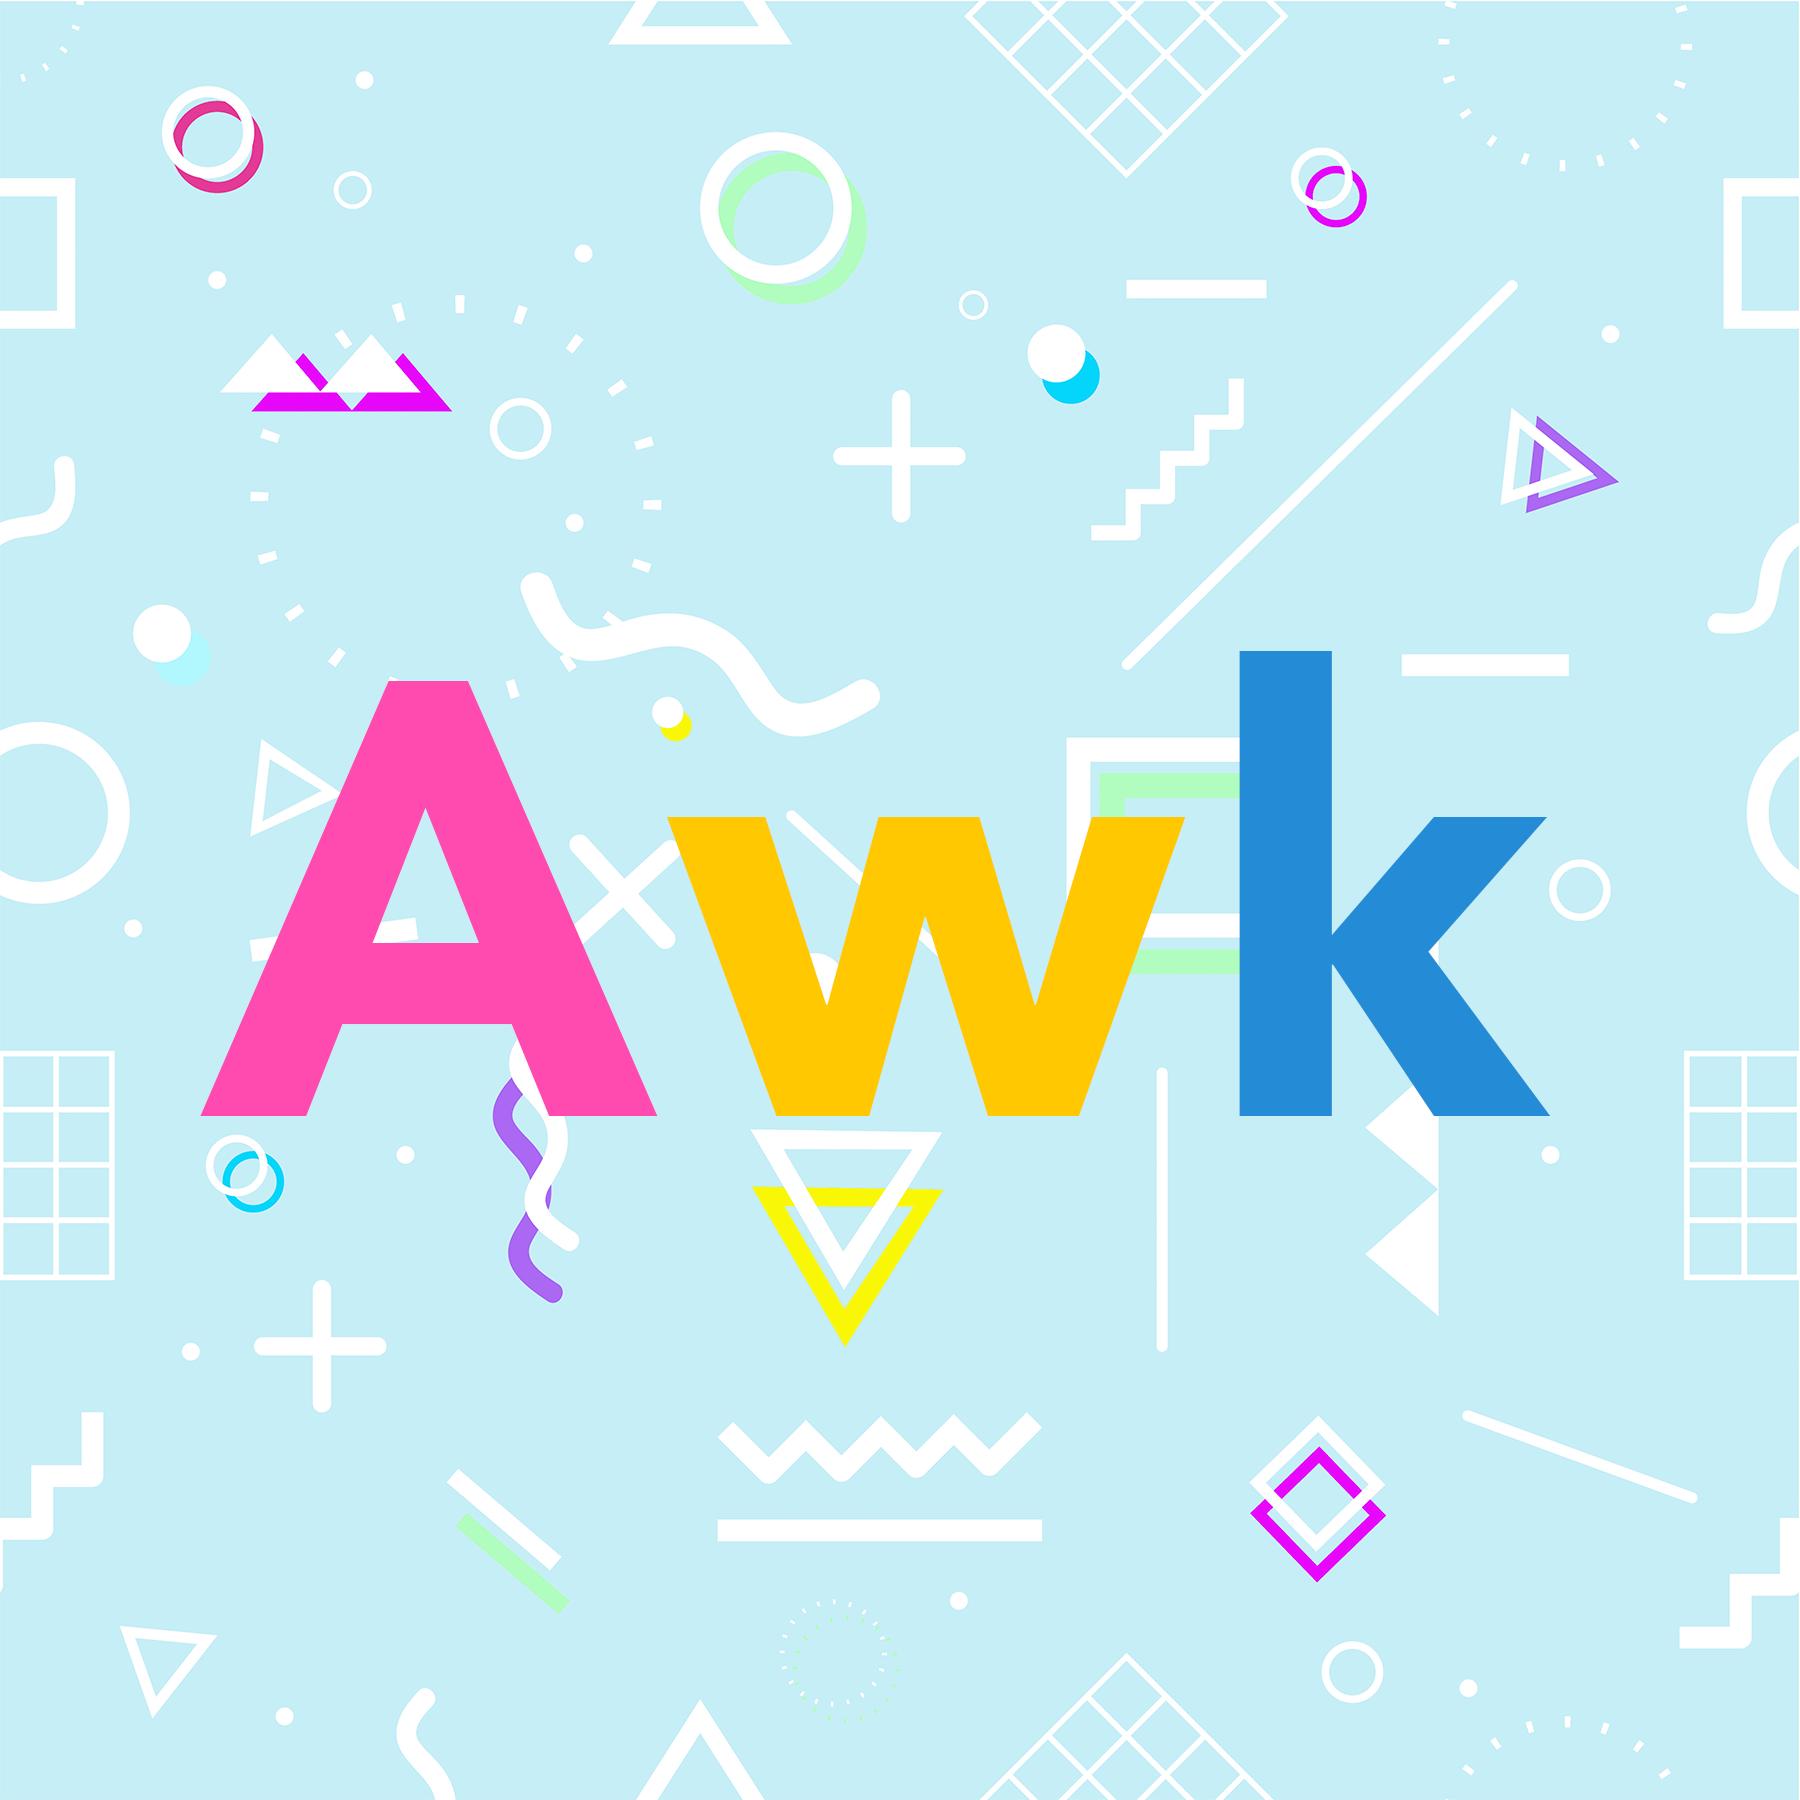 AwkWord Compliments